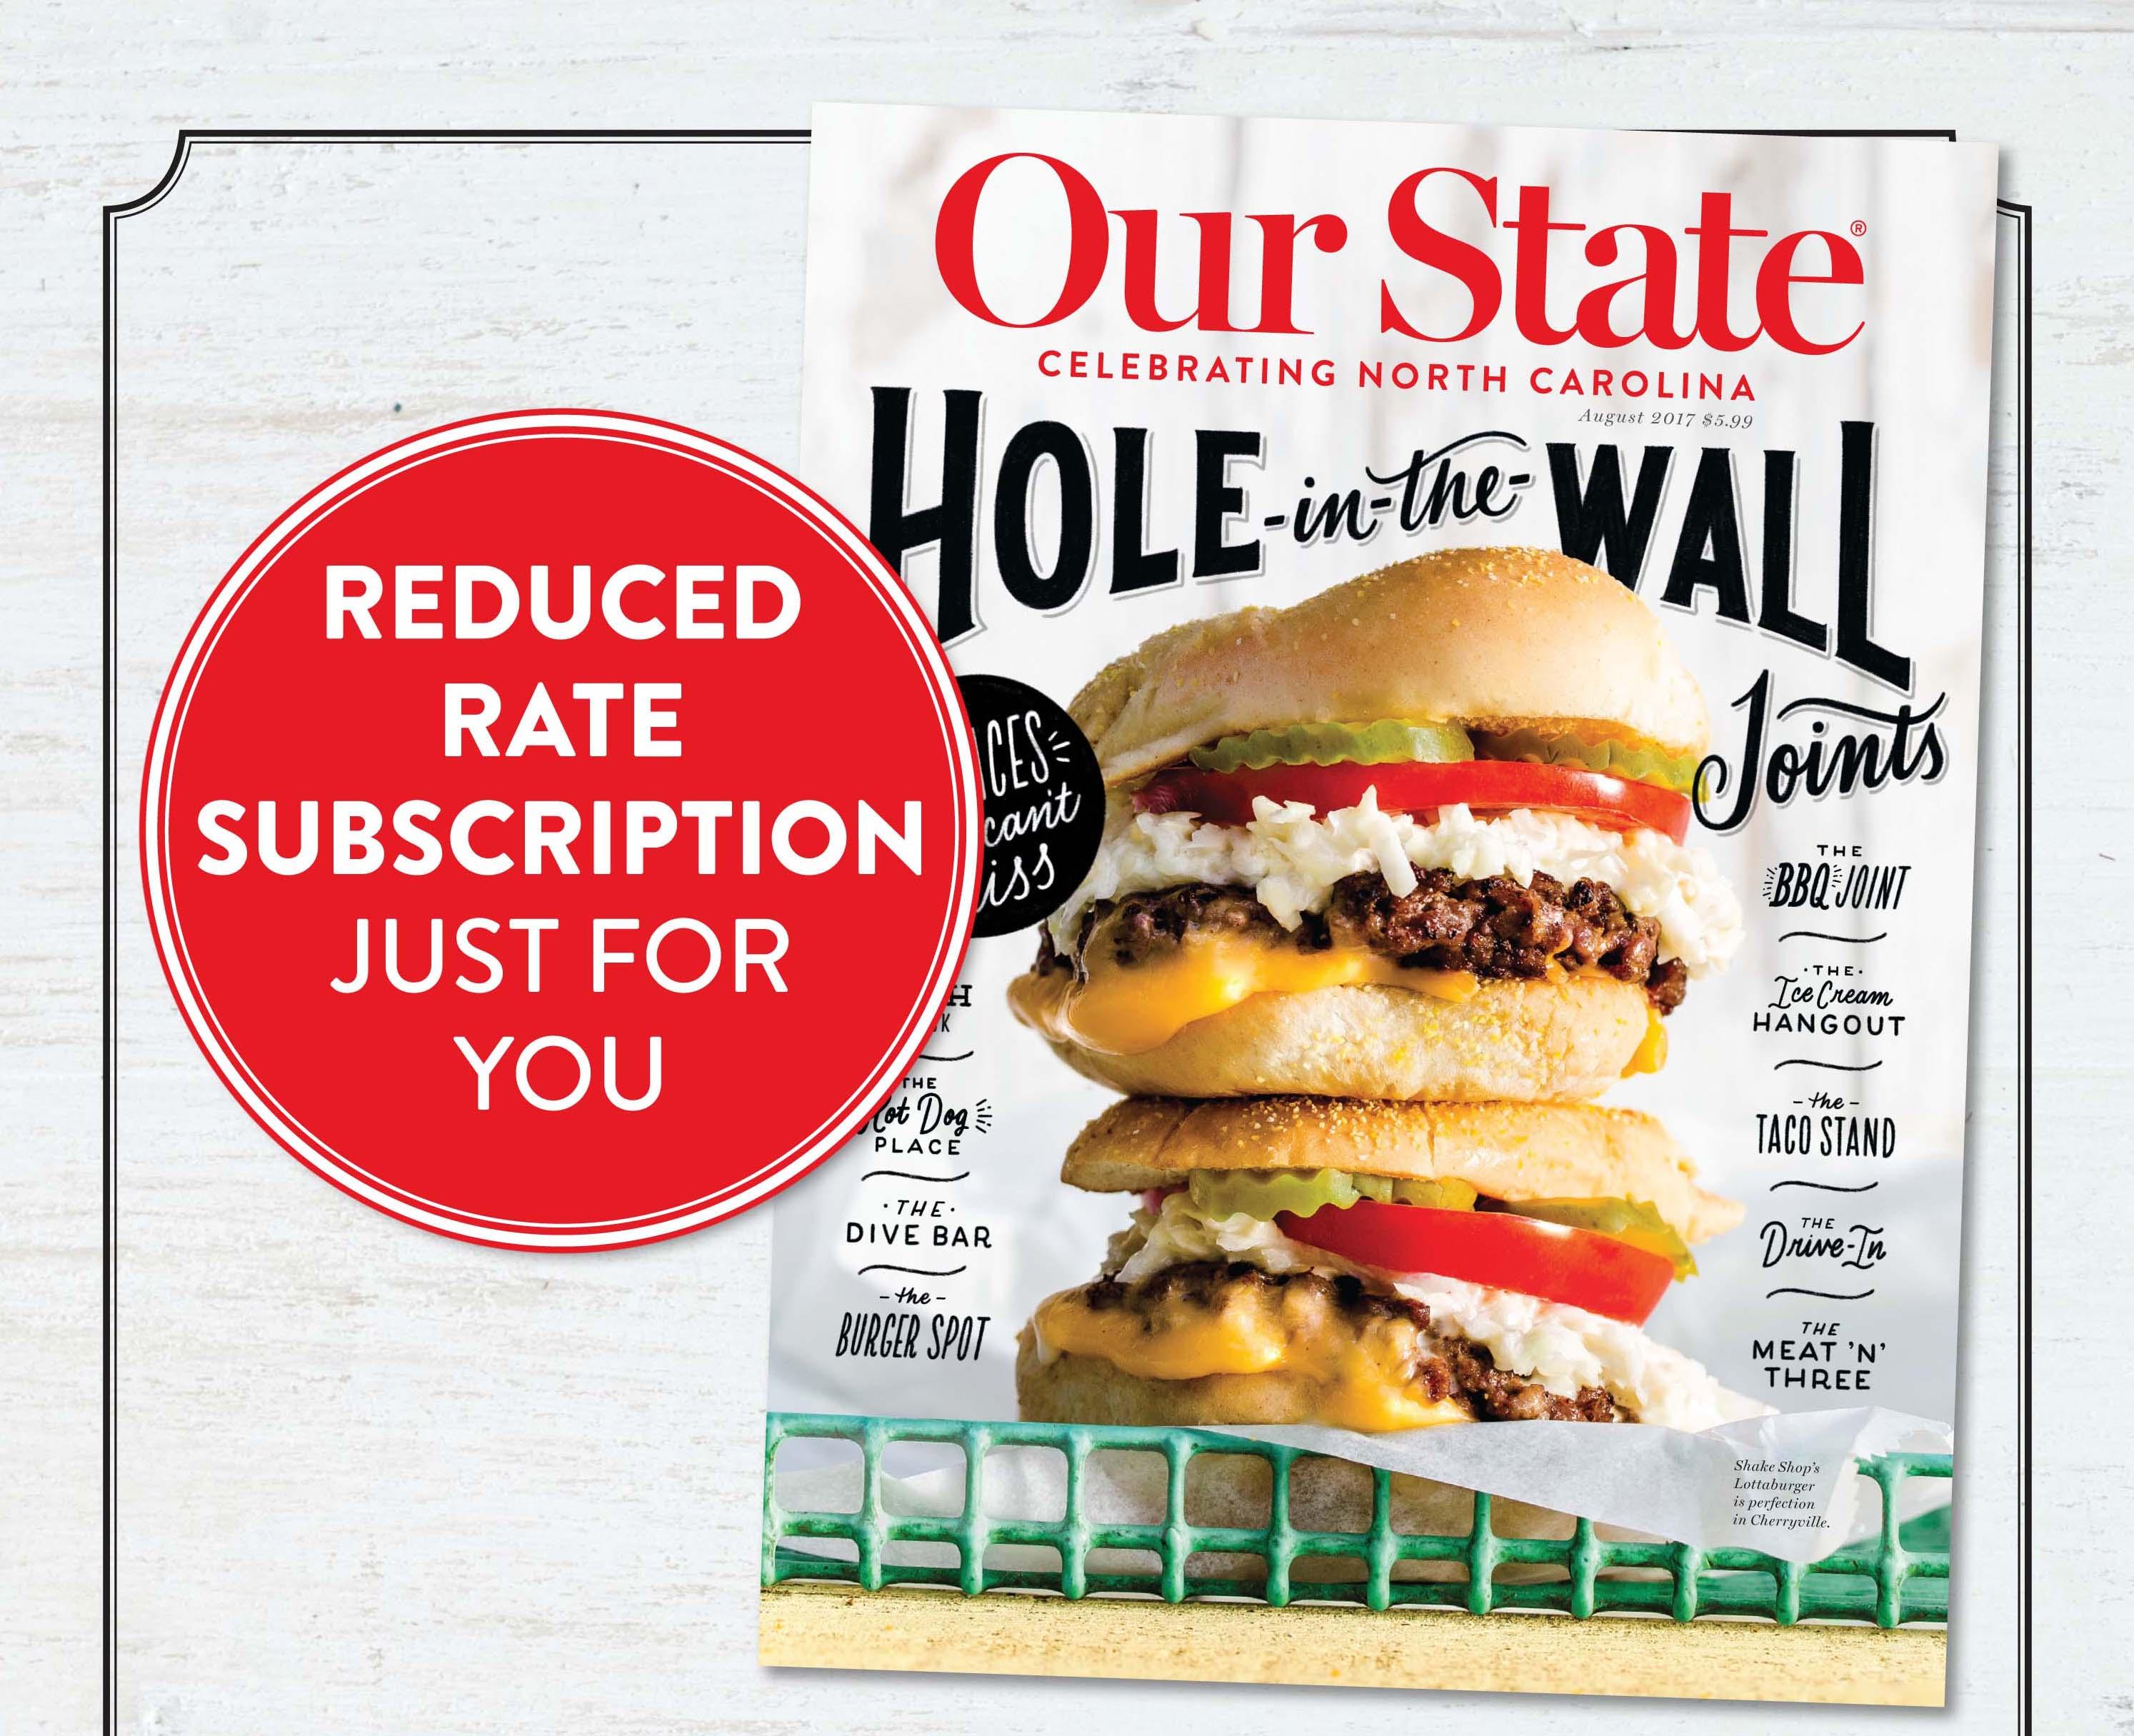 Get Free Copies of Our State Magazine! - Carolina Civic Center